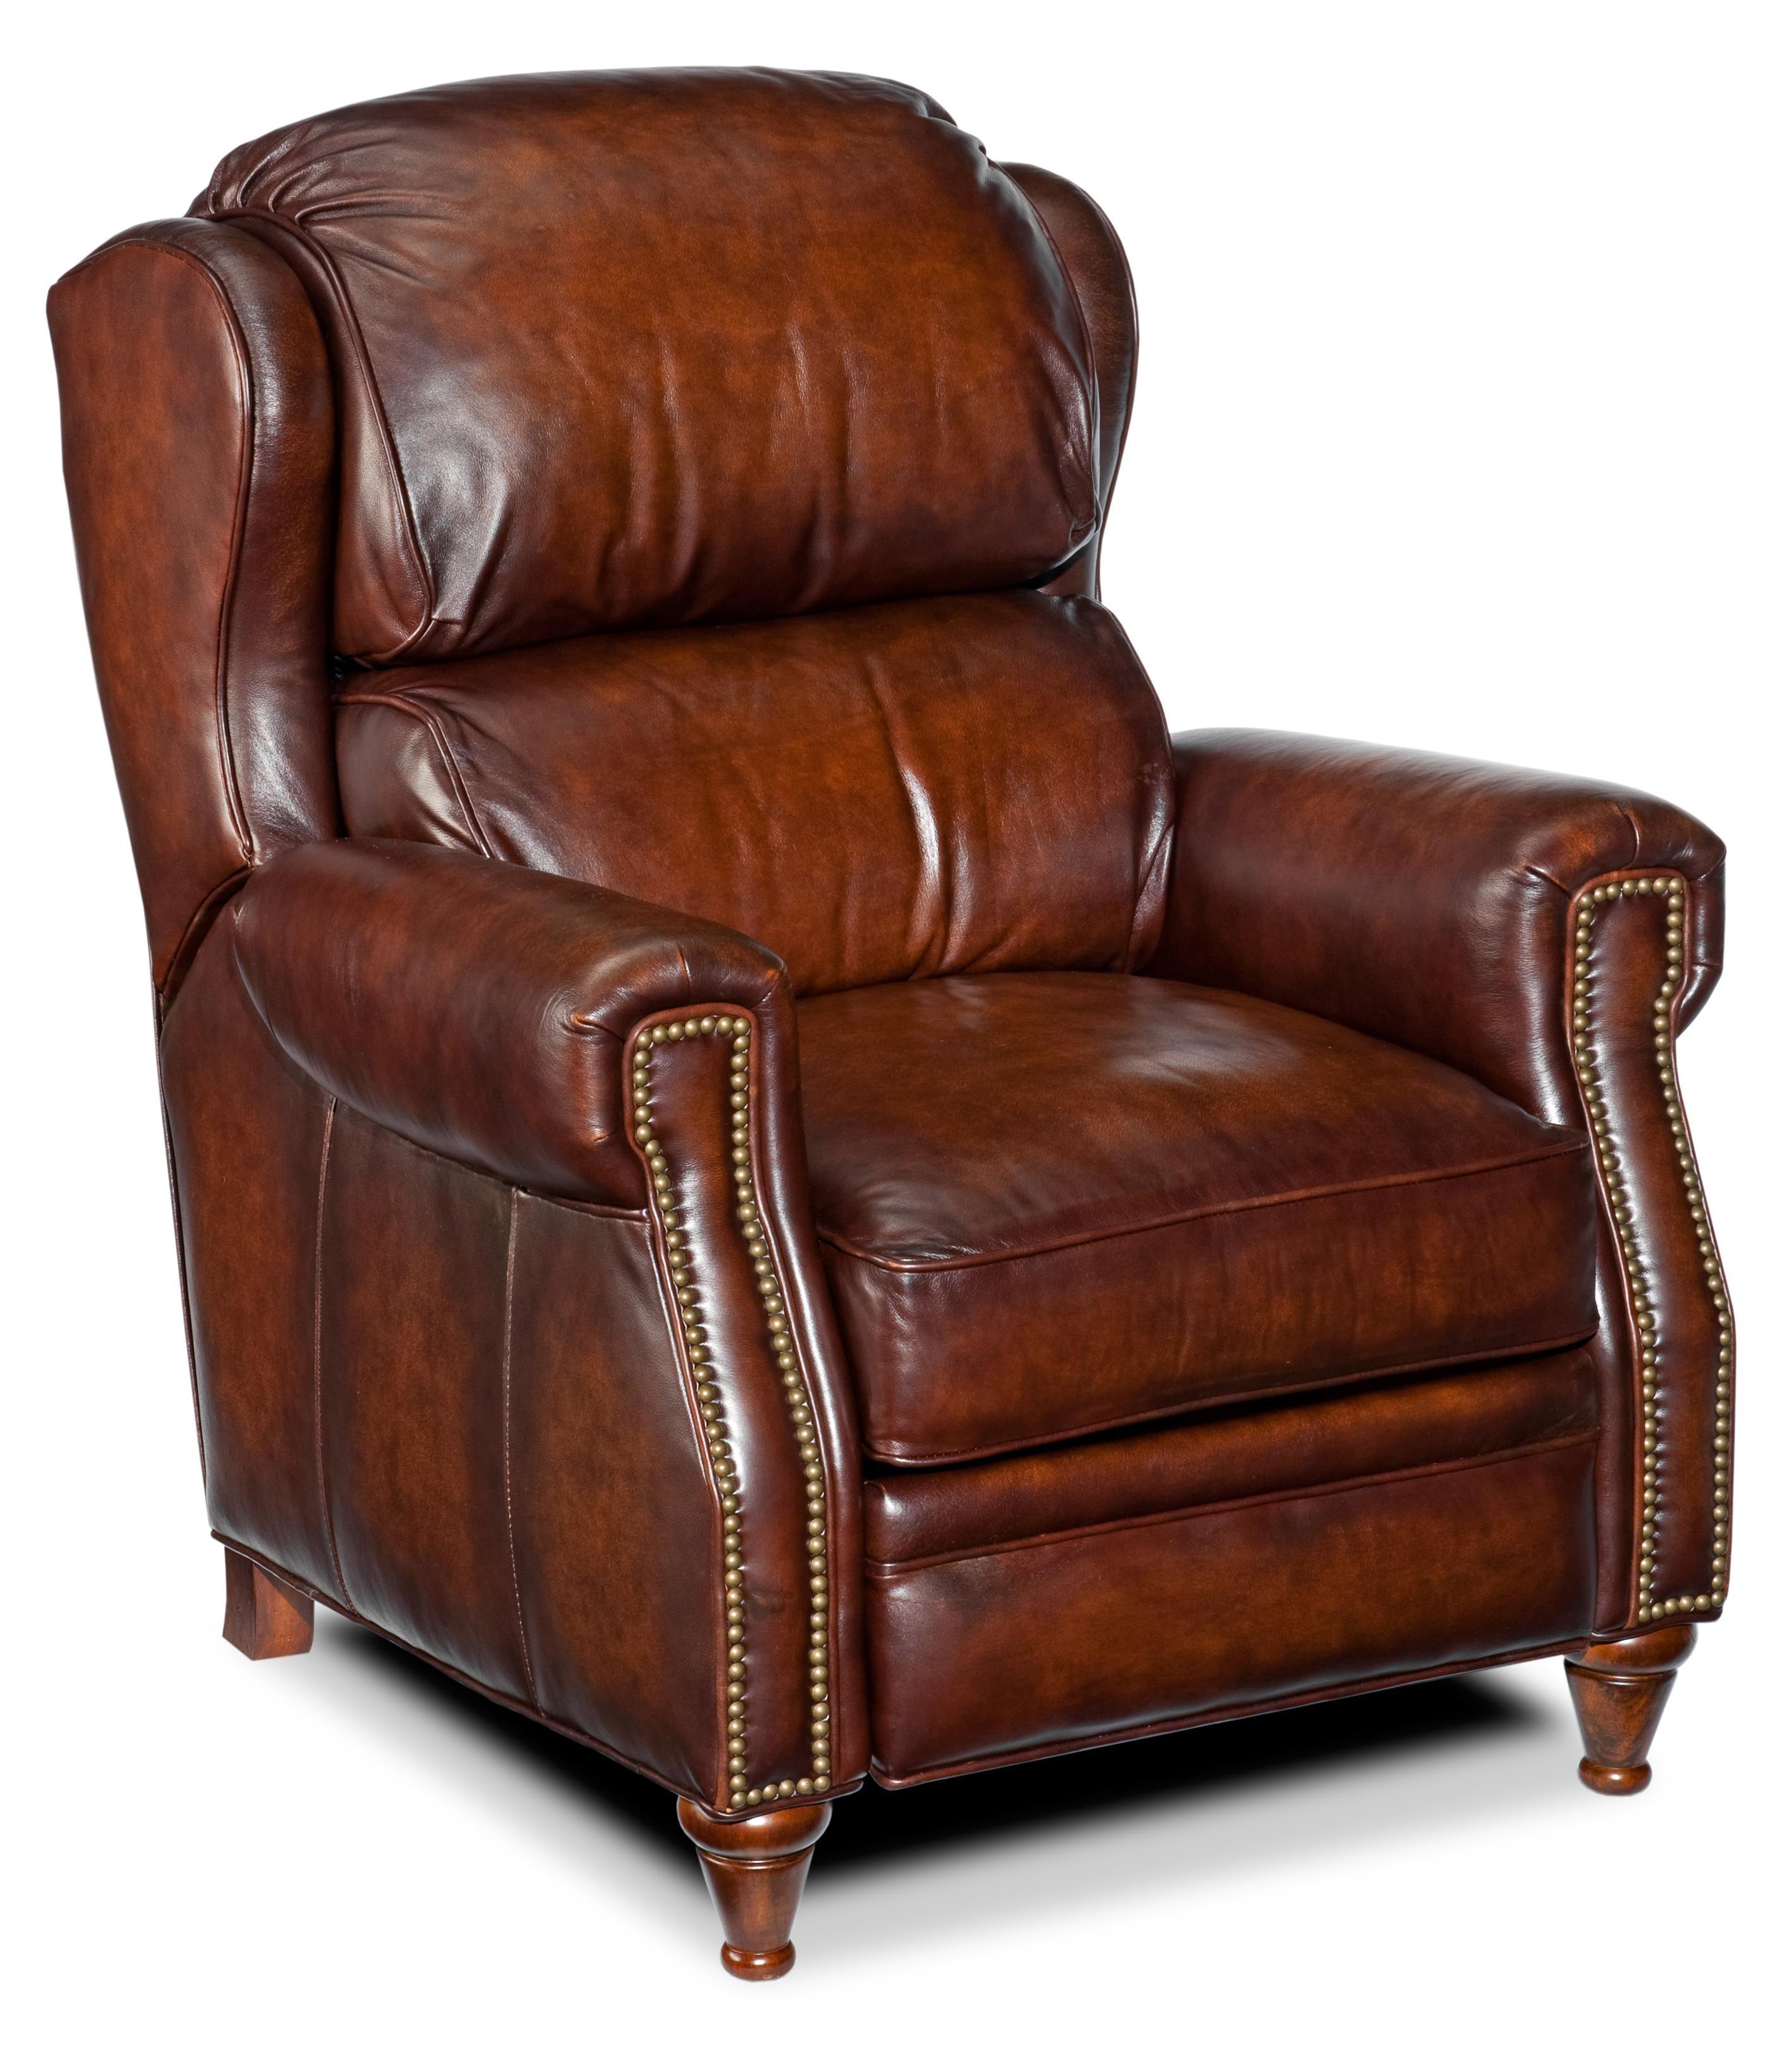 Hooker Furniture Reclining Chairs High Leg Recliner - Item Number: RC277